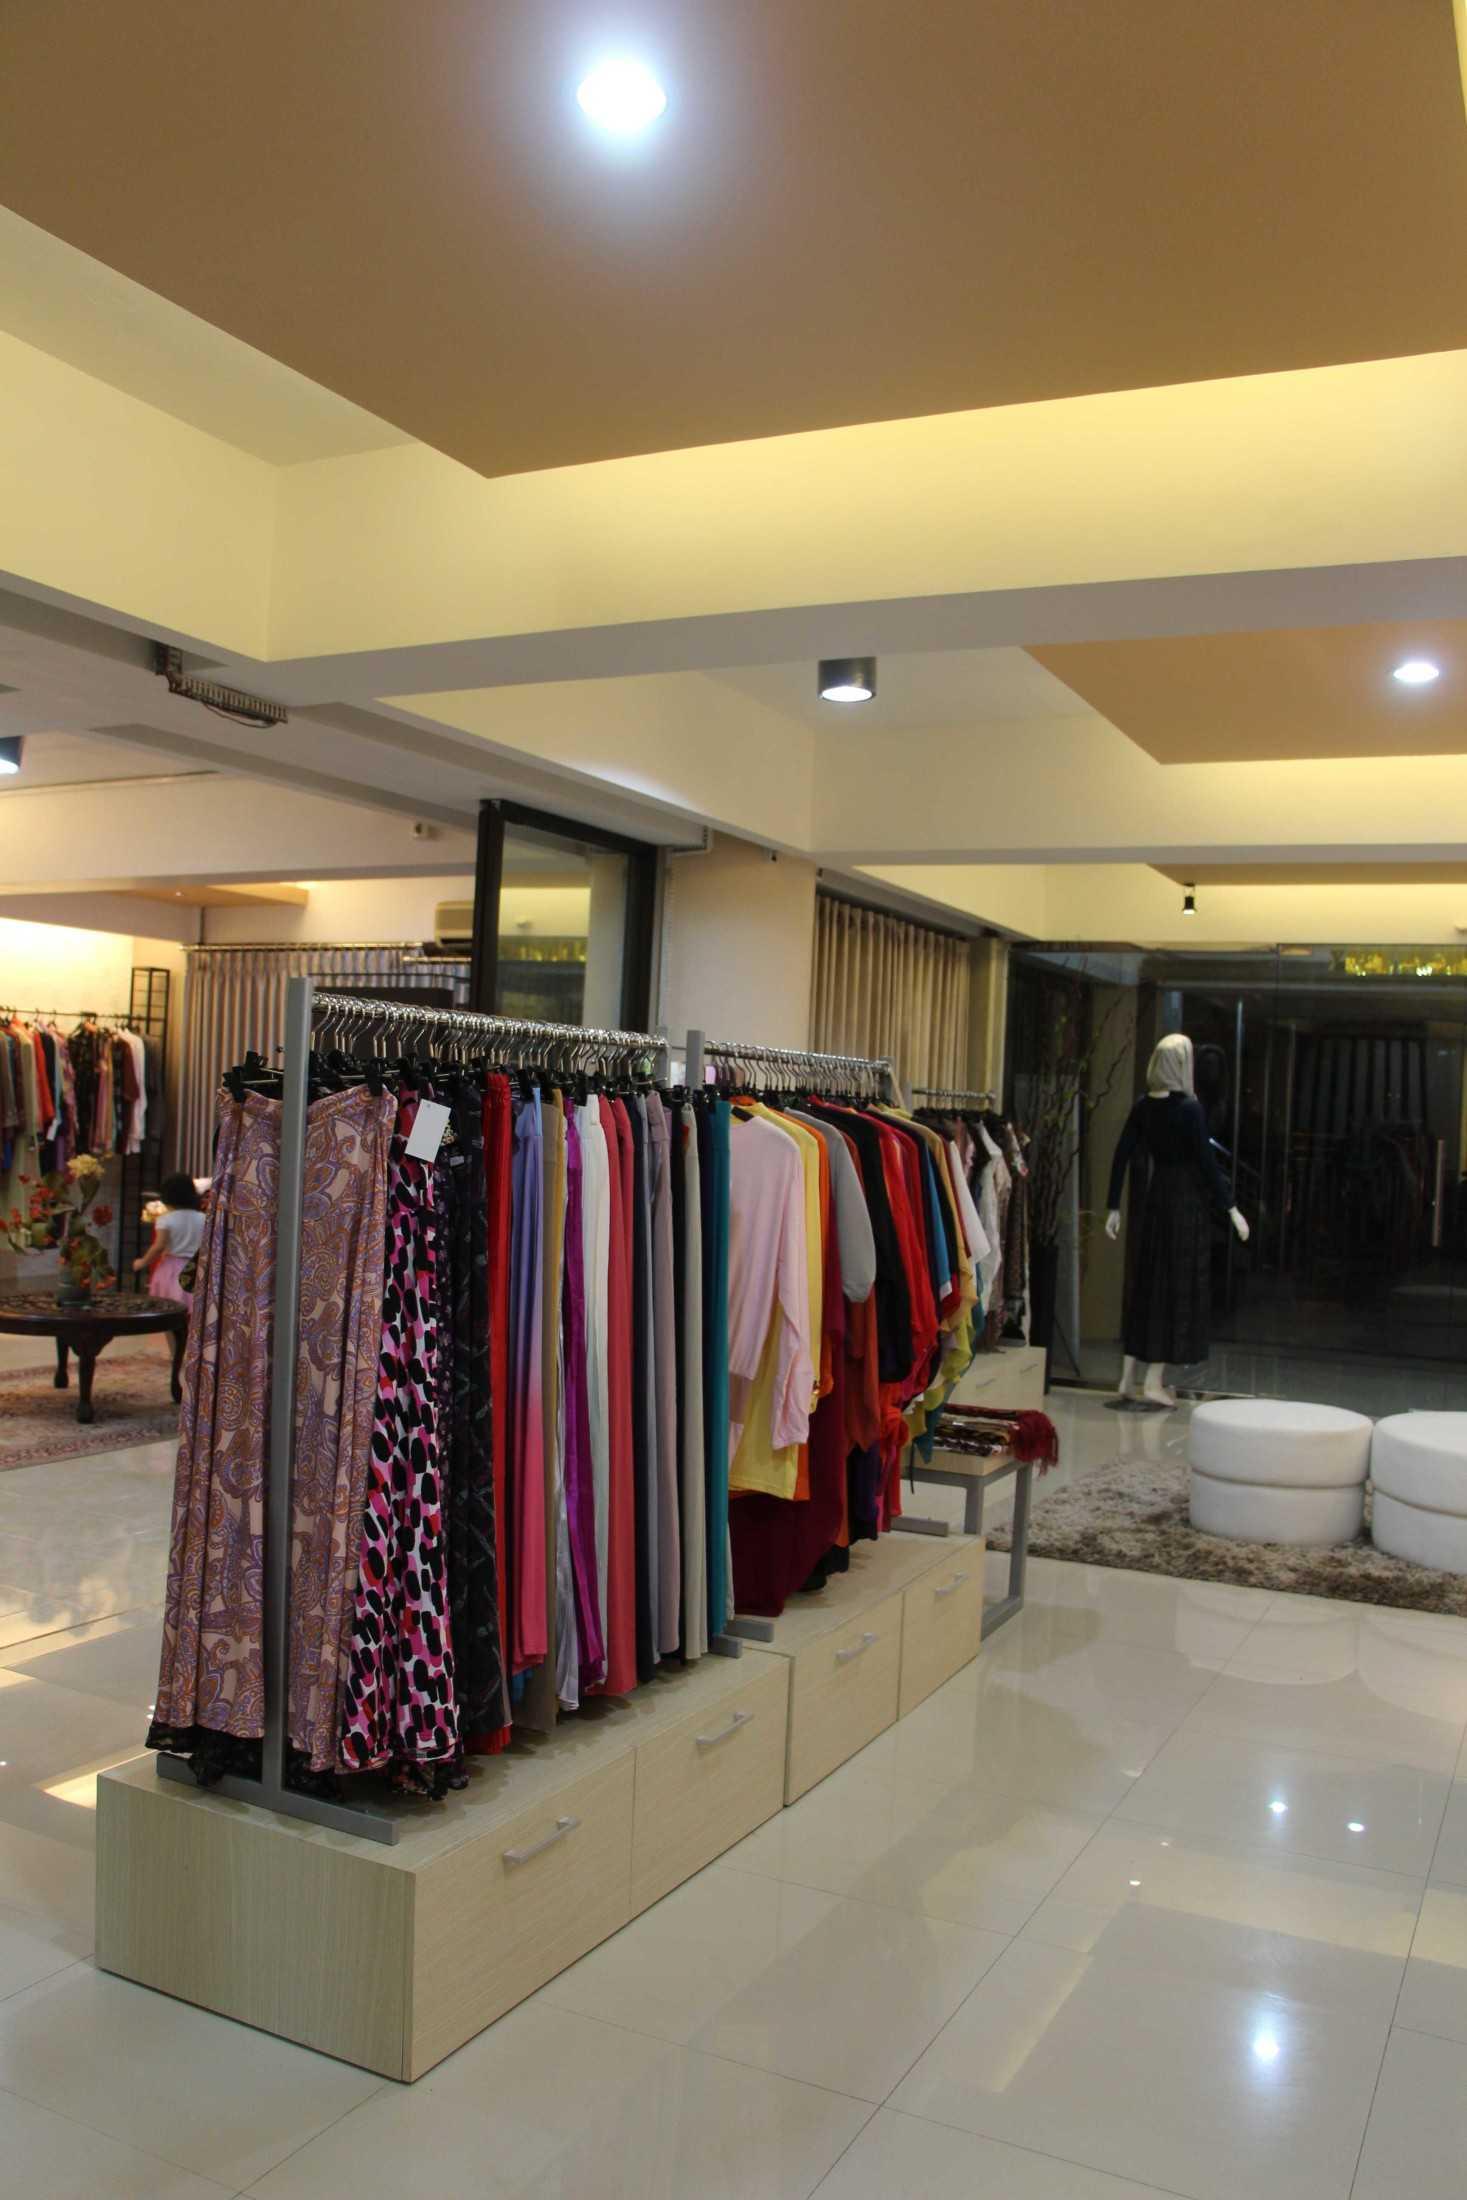 4Linked Architect Butik Zaza Surabaya, Kota Sby, Jawa Timur, Indonesia Surabaya, Kota Sby, Jawa Timur, Indonesia 4Linked-Architect-Butik-Zaza  75197